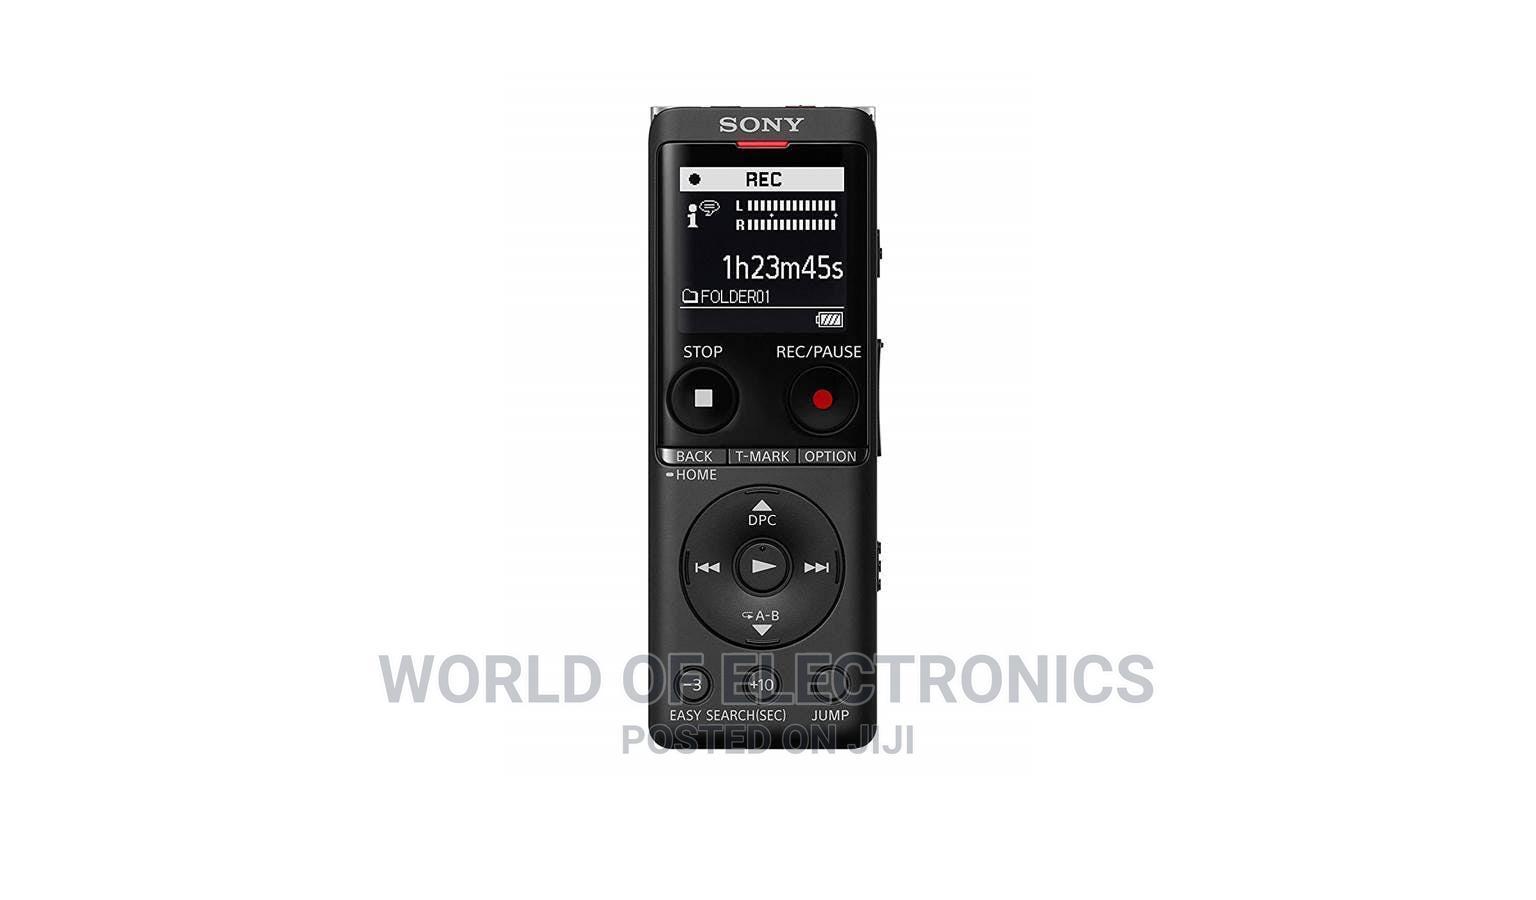 Sony ICD-UX570F/B Digital Voice Recorder - Black